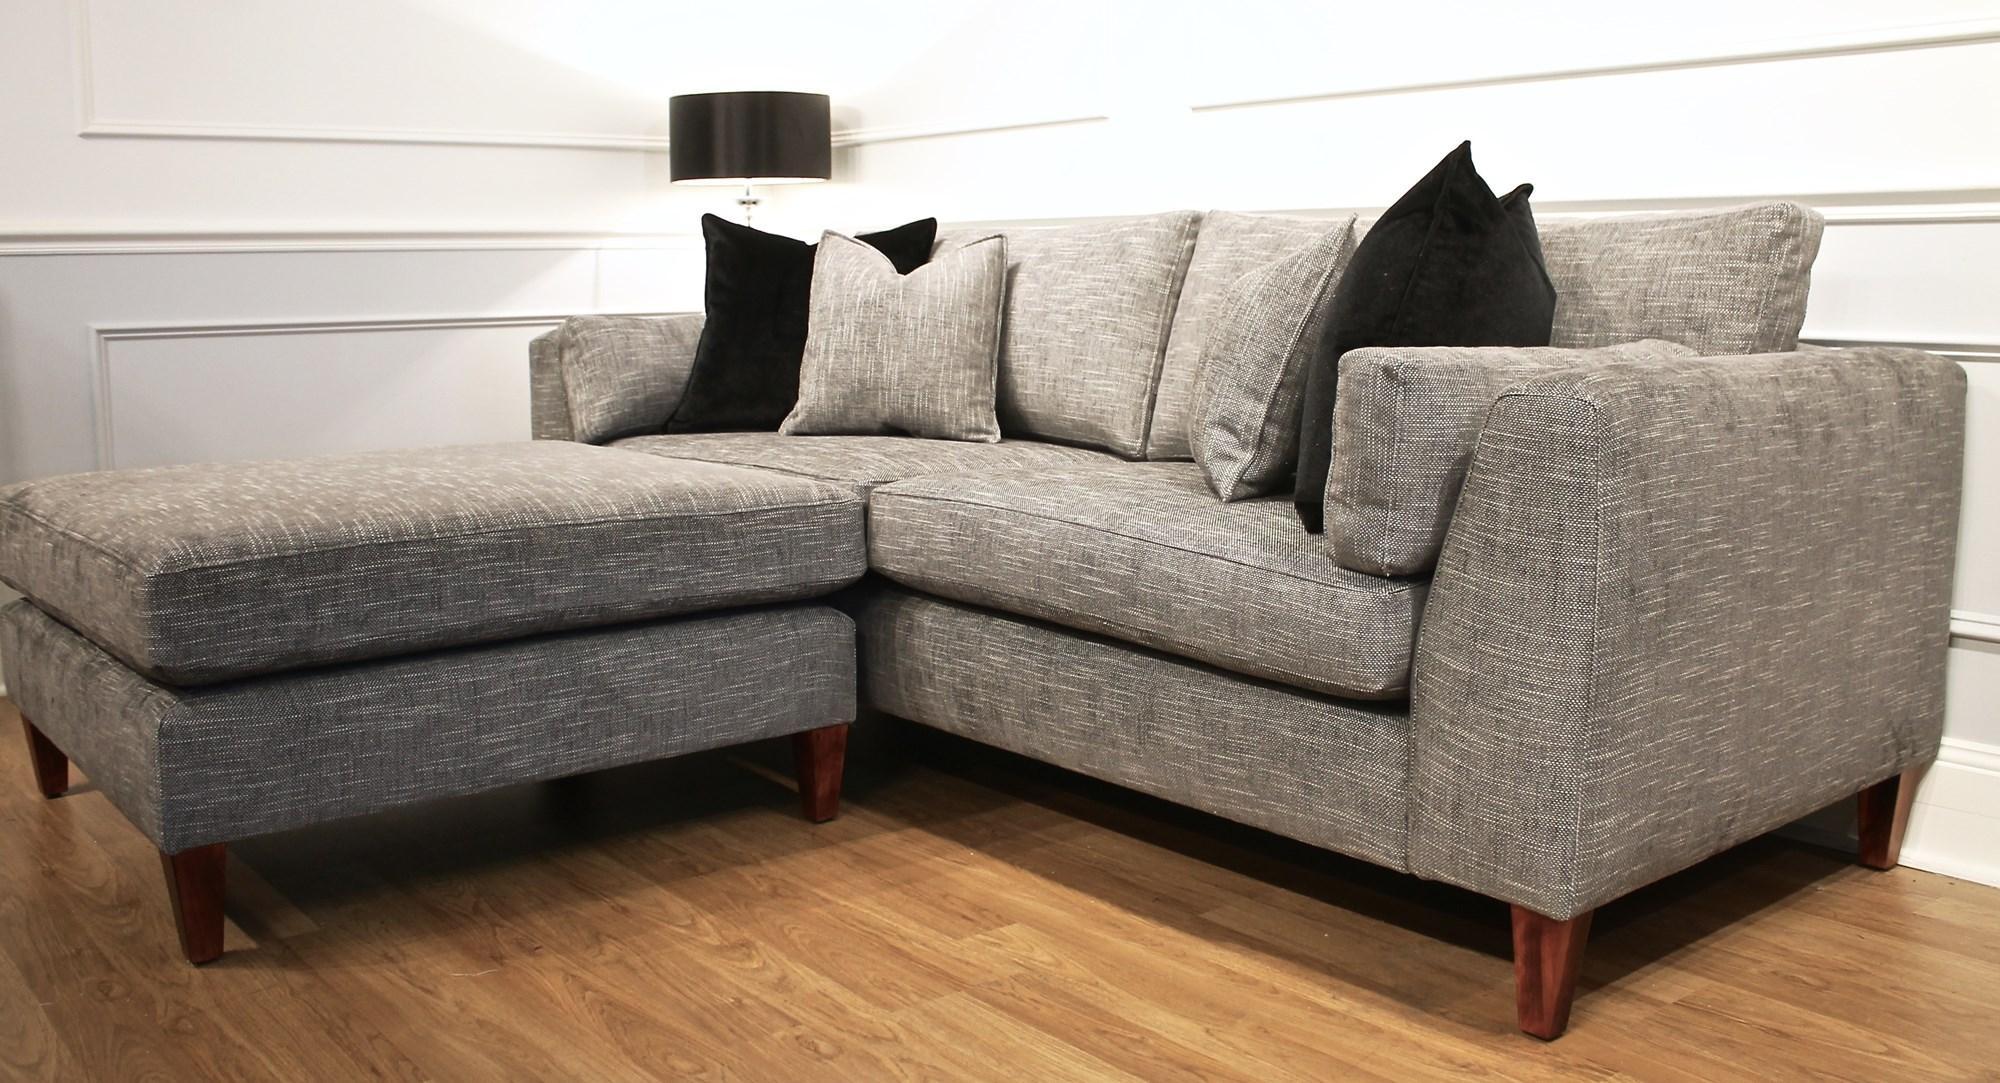 Linen Sofas Australia | Tehranmix Decoration For Tufted Linen Sofas (Image 11 of 20)